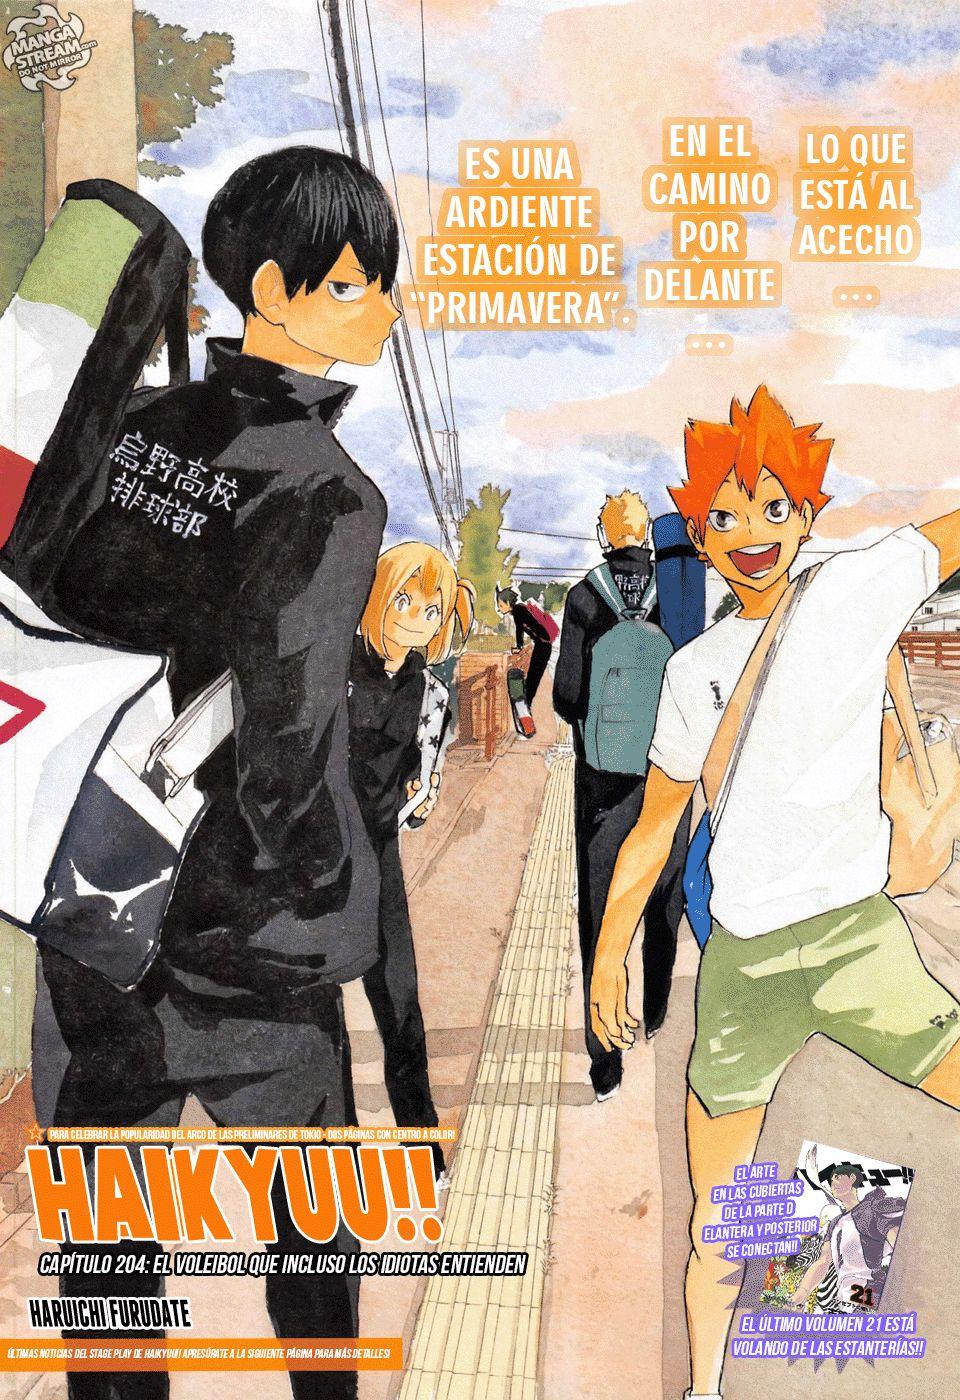 http://c5.ninemanga.com/es_manga/10/10/466807/5de2f42aa1d0450146bcbf74a815dc75.jpg Page 2